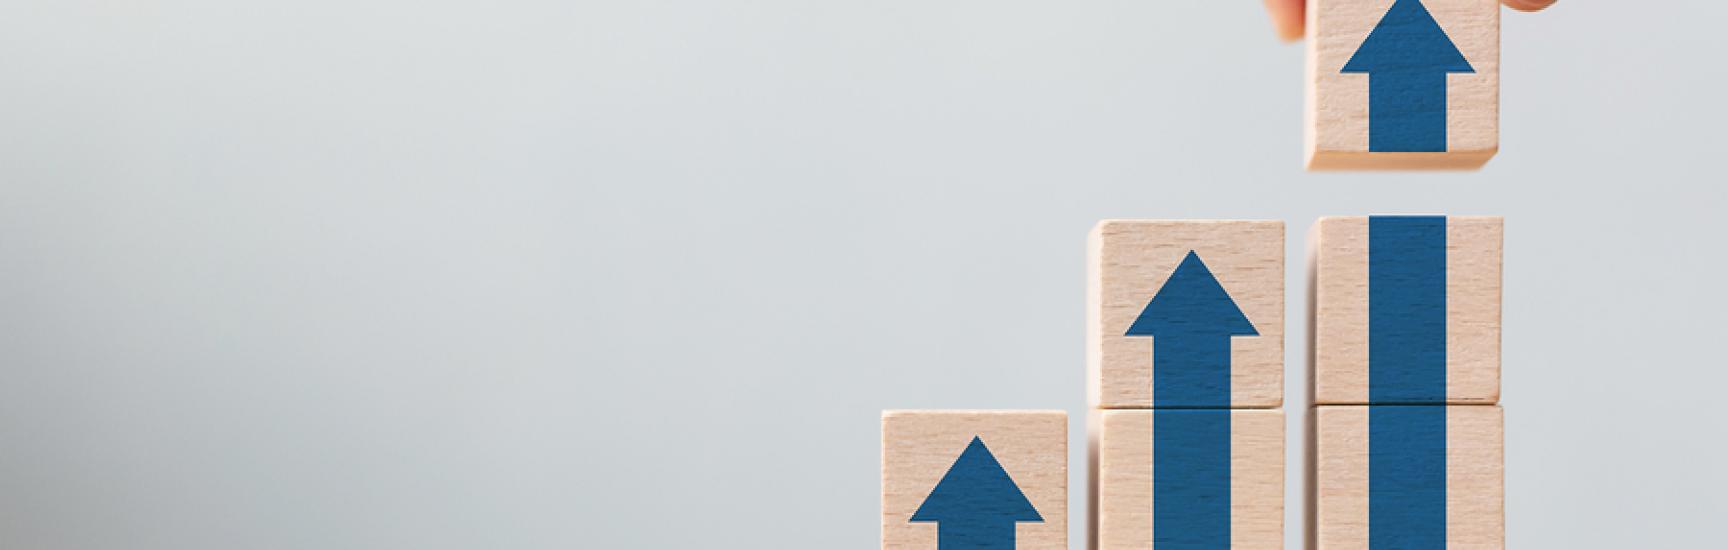 surex ladder career path business